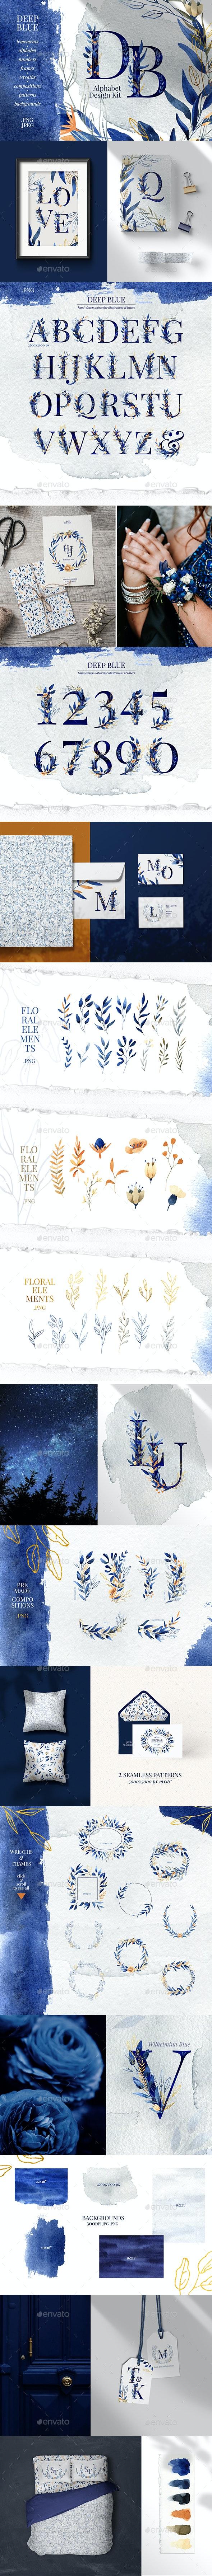 Deep Blue Alphabet Watercolor Design Kit - Objects Illustrations